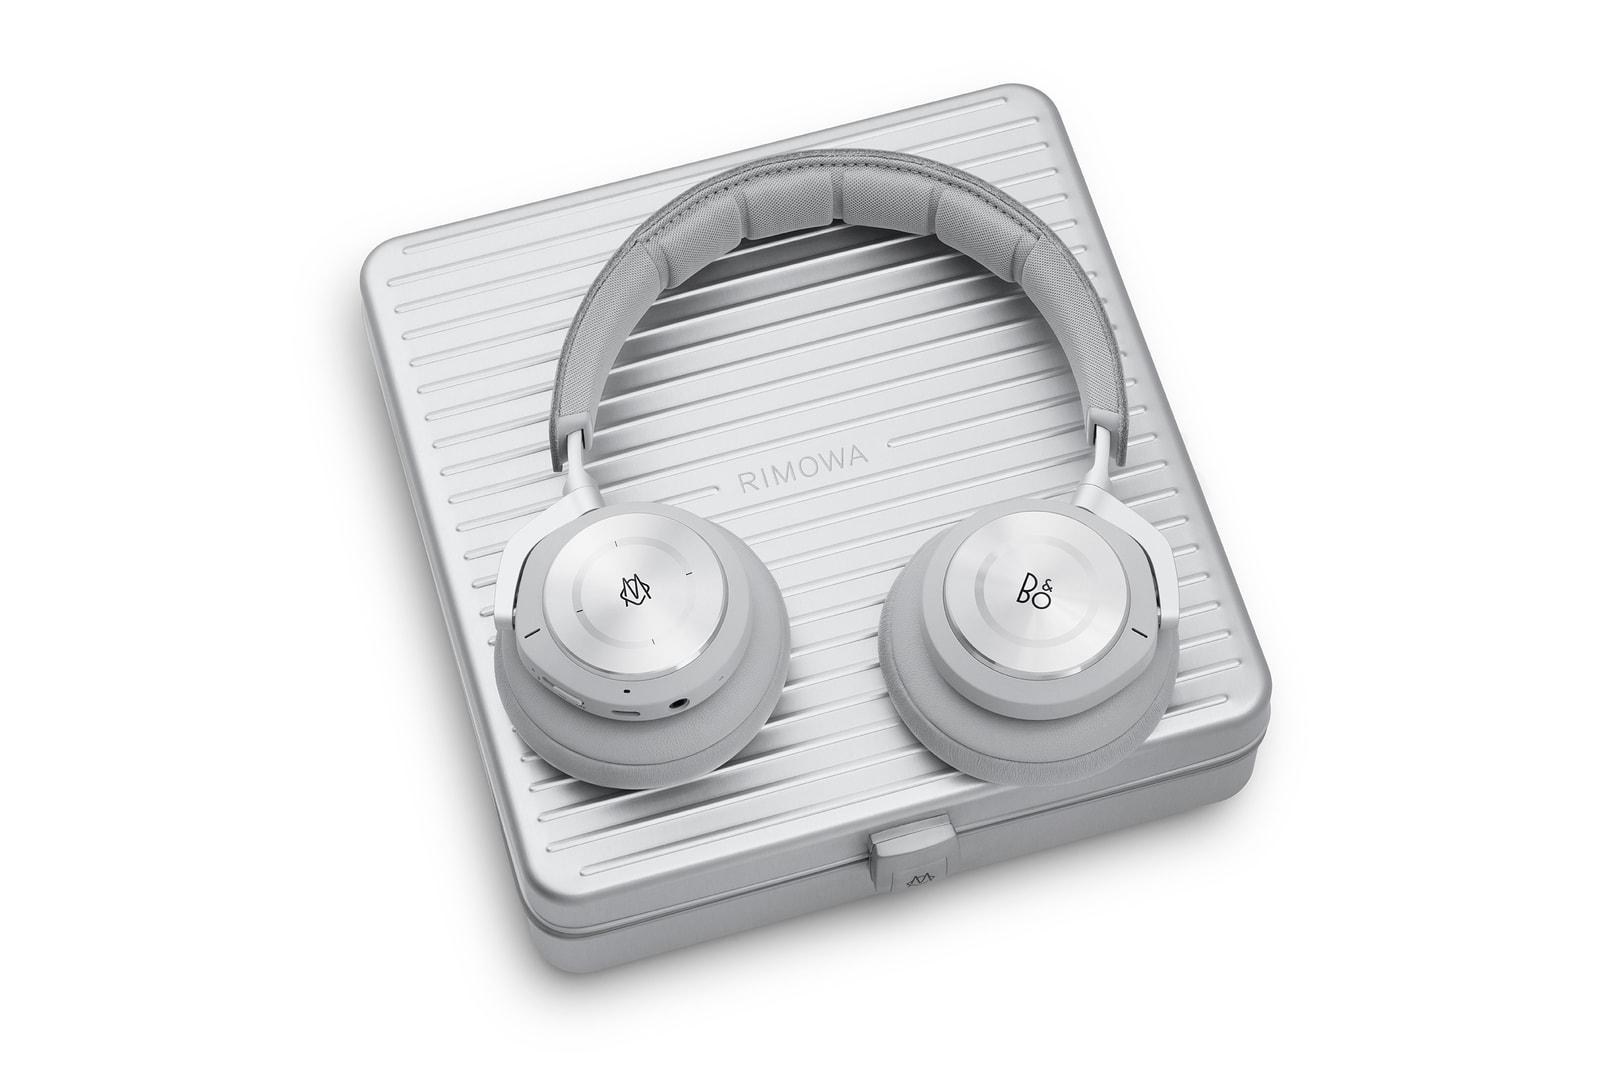 RIMOWA x Bang & Olufsen 全新聯名 Beoplay H9i 無線藍牙耳機登場